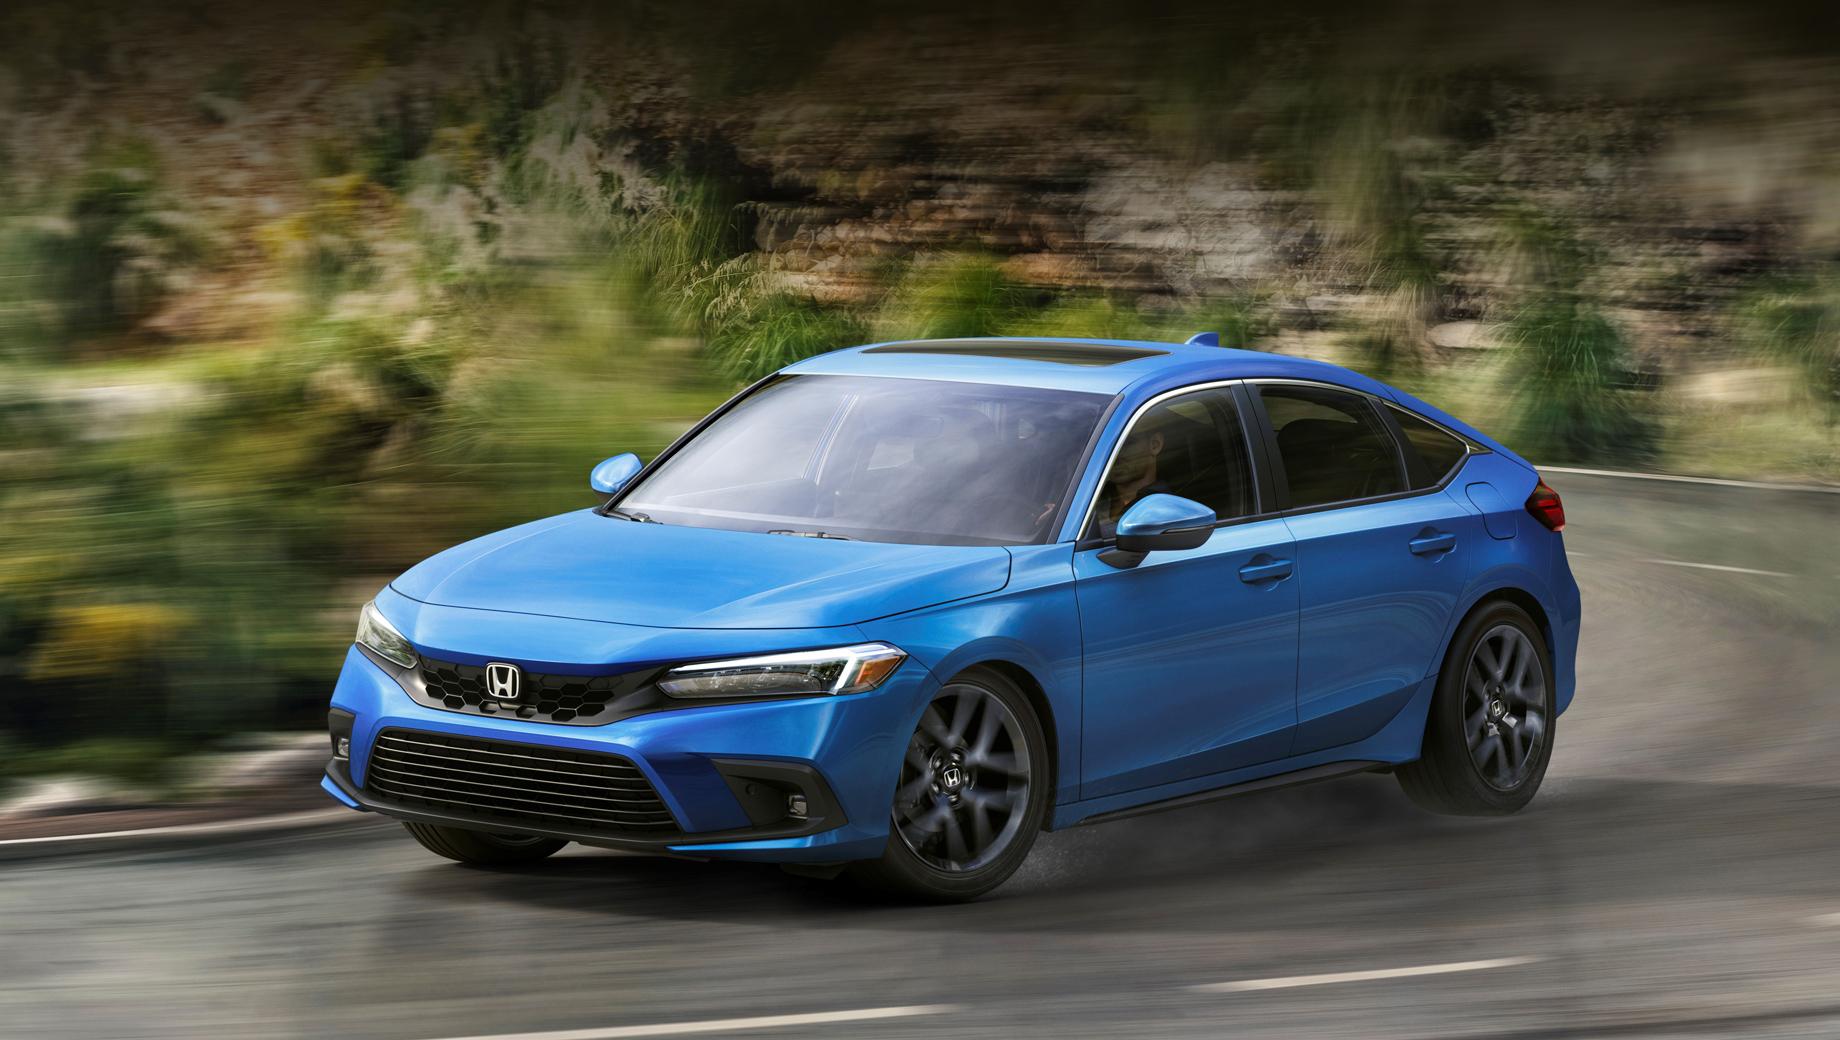 Honda civic. Длина, ширина, высота и колёсная база равны 4549 мм (+30 мм к предшественнику), 1800 (+2 мм), 1414 (-15 мм), 2736 (+36 мм).